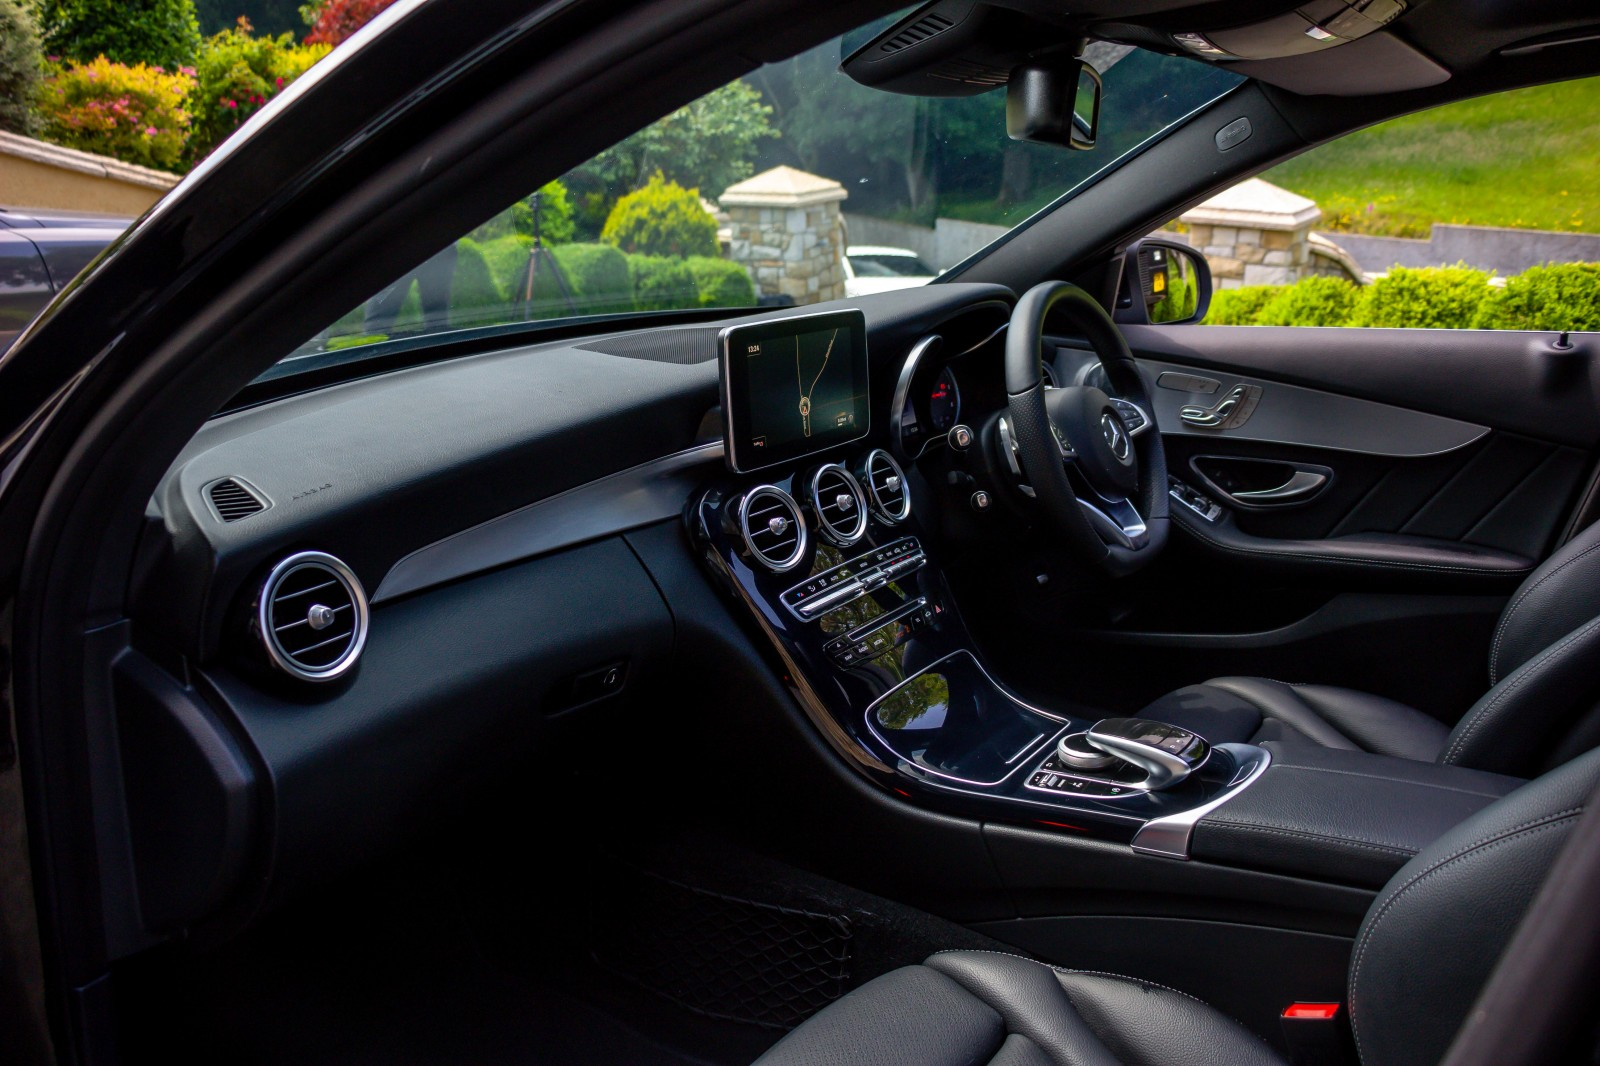 2017 Mercedes-Benz C Class C 250 D 4MATIC AMG LINE PREMIUM PLUS Diesel Automatic – Morgan Cars 9 Mound Road, Warrenpoint, Newry BT34 3LW, UK full